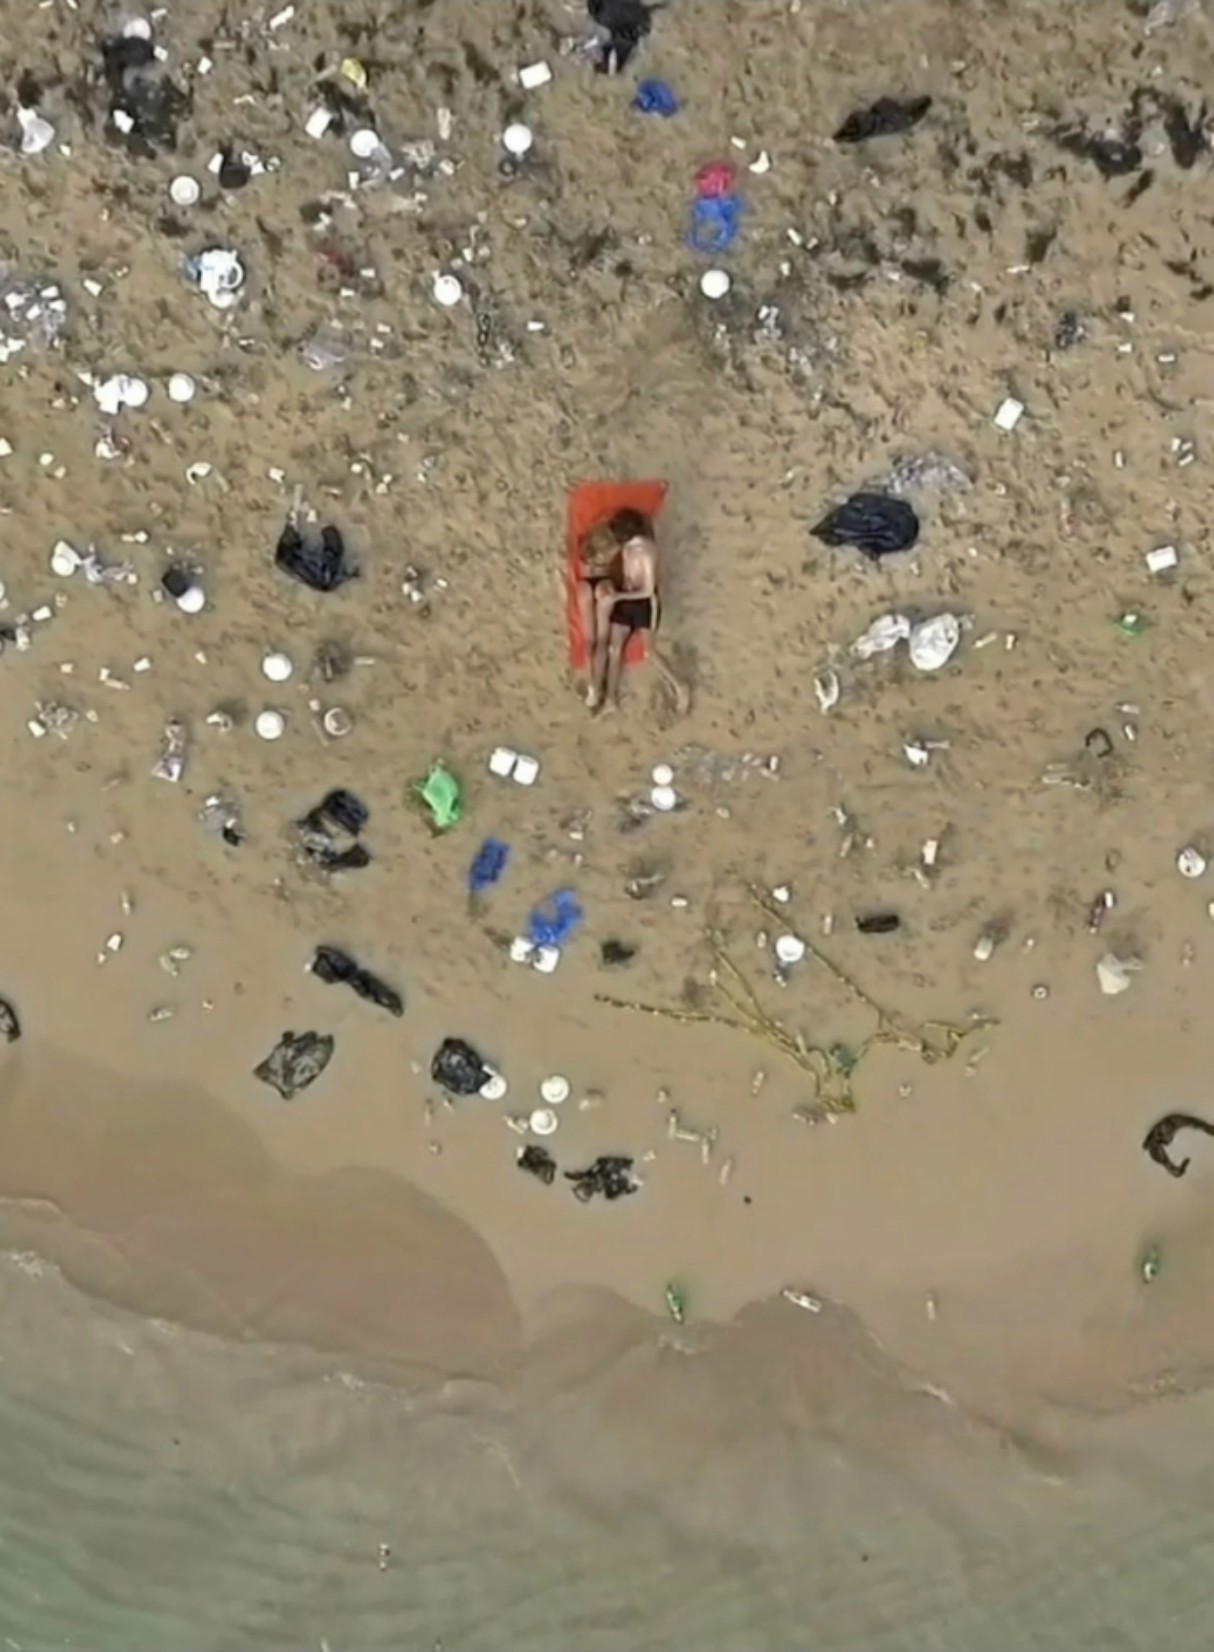 pornhub-dirtiest-ever-porn-ocean-clean-up-2